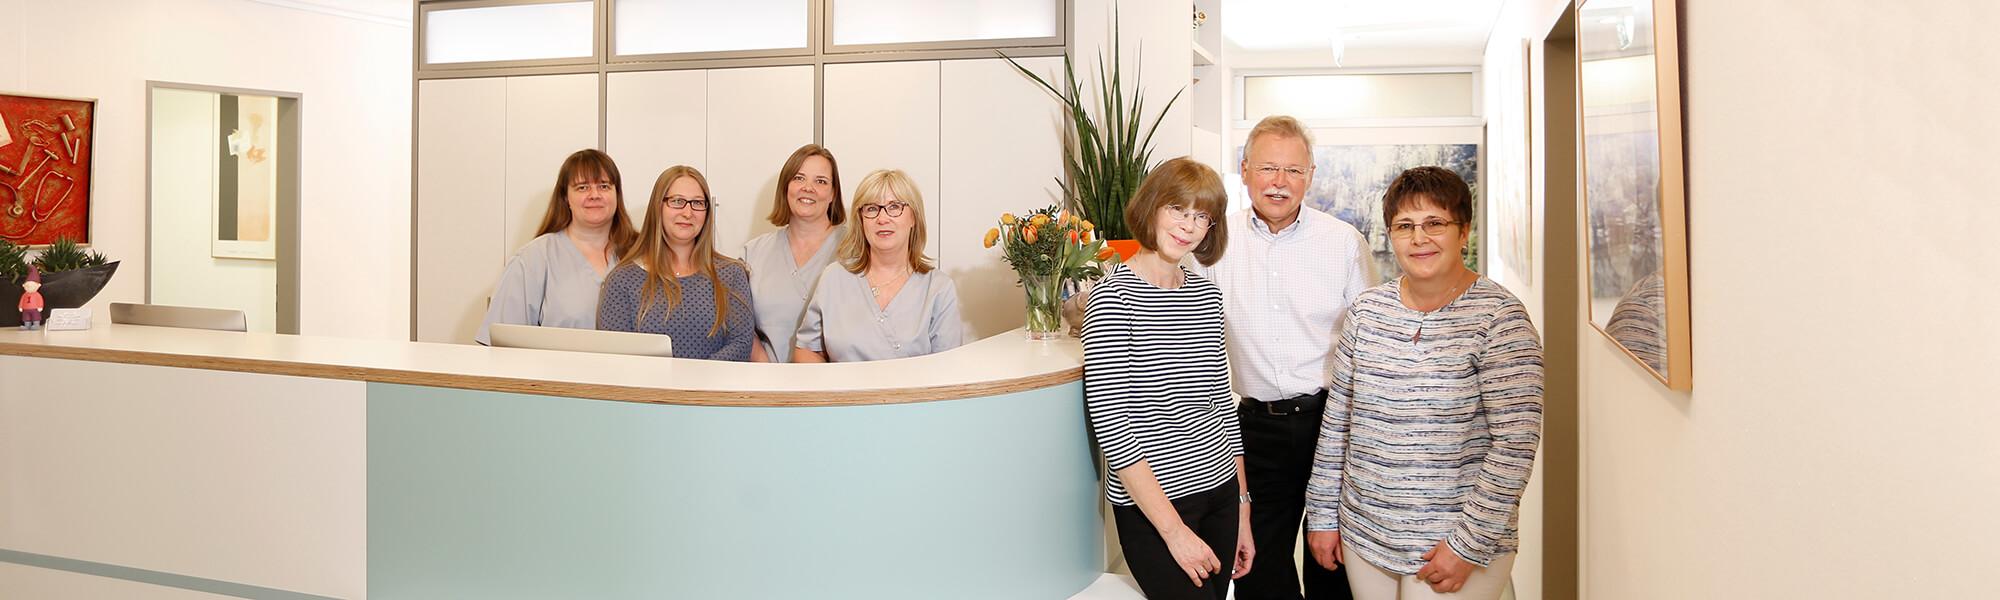 Hausarzt Lage - Dr. Burghardt - Team